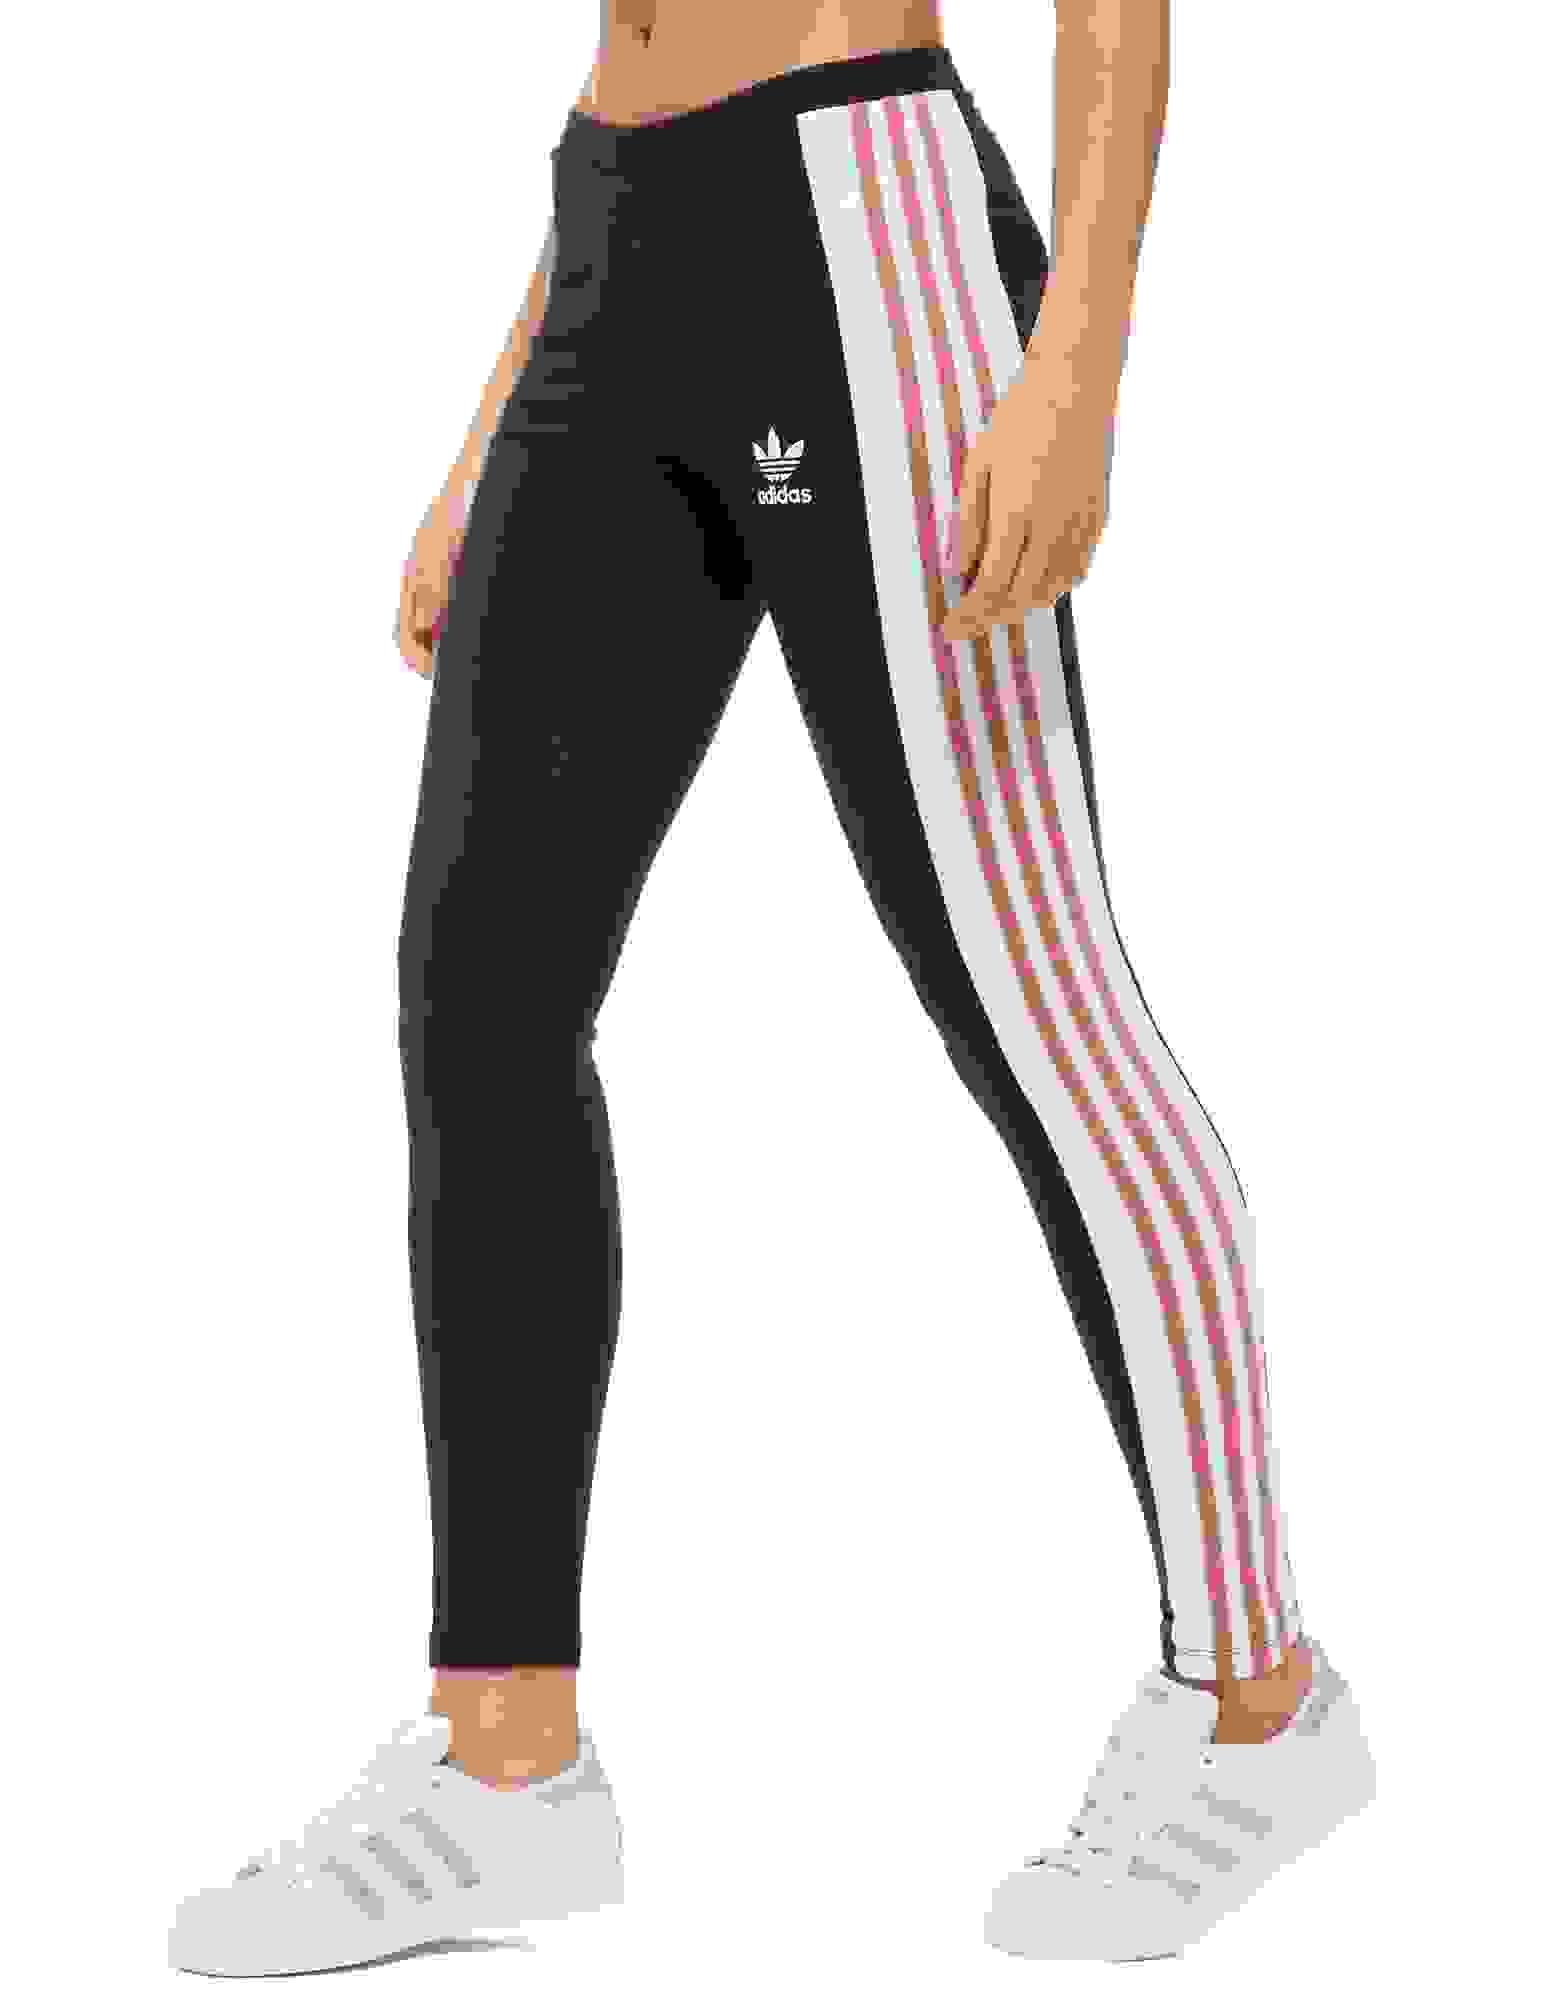 Adidas 3 stripes stripes stripes crew leggings   Défi J'arrête, j'y gagne! e3fbe7